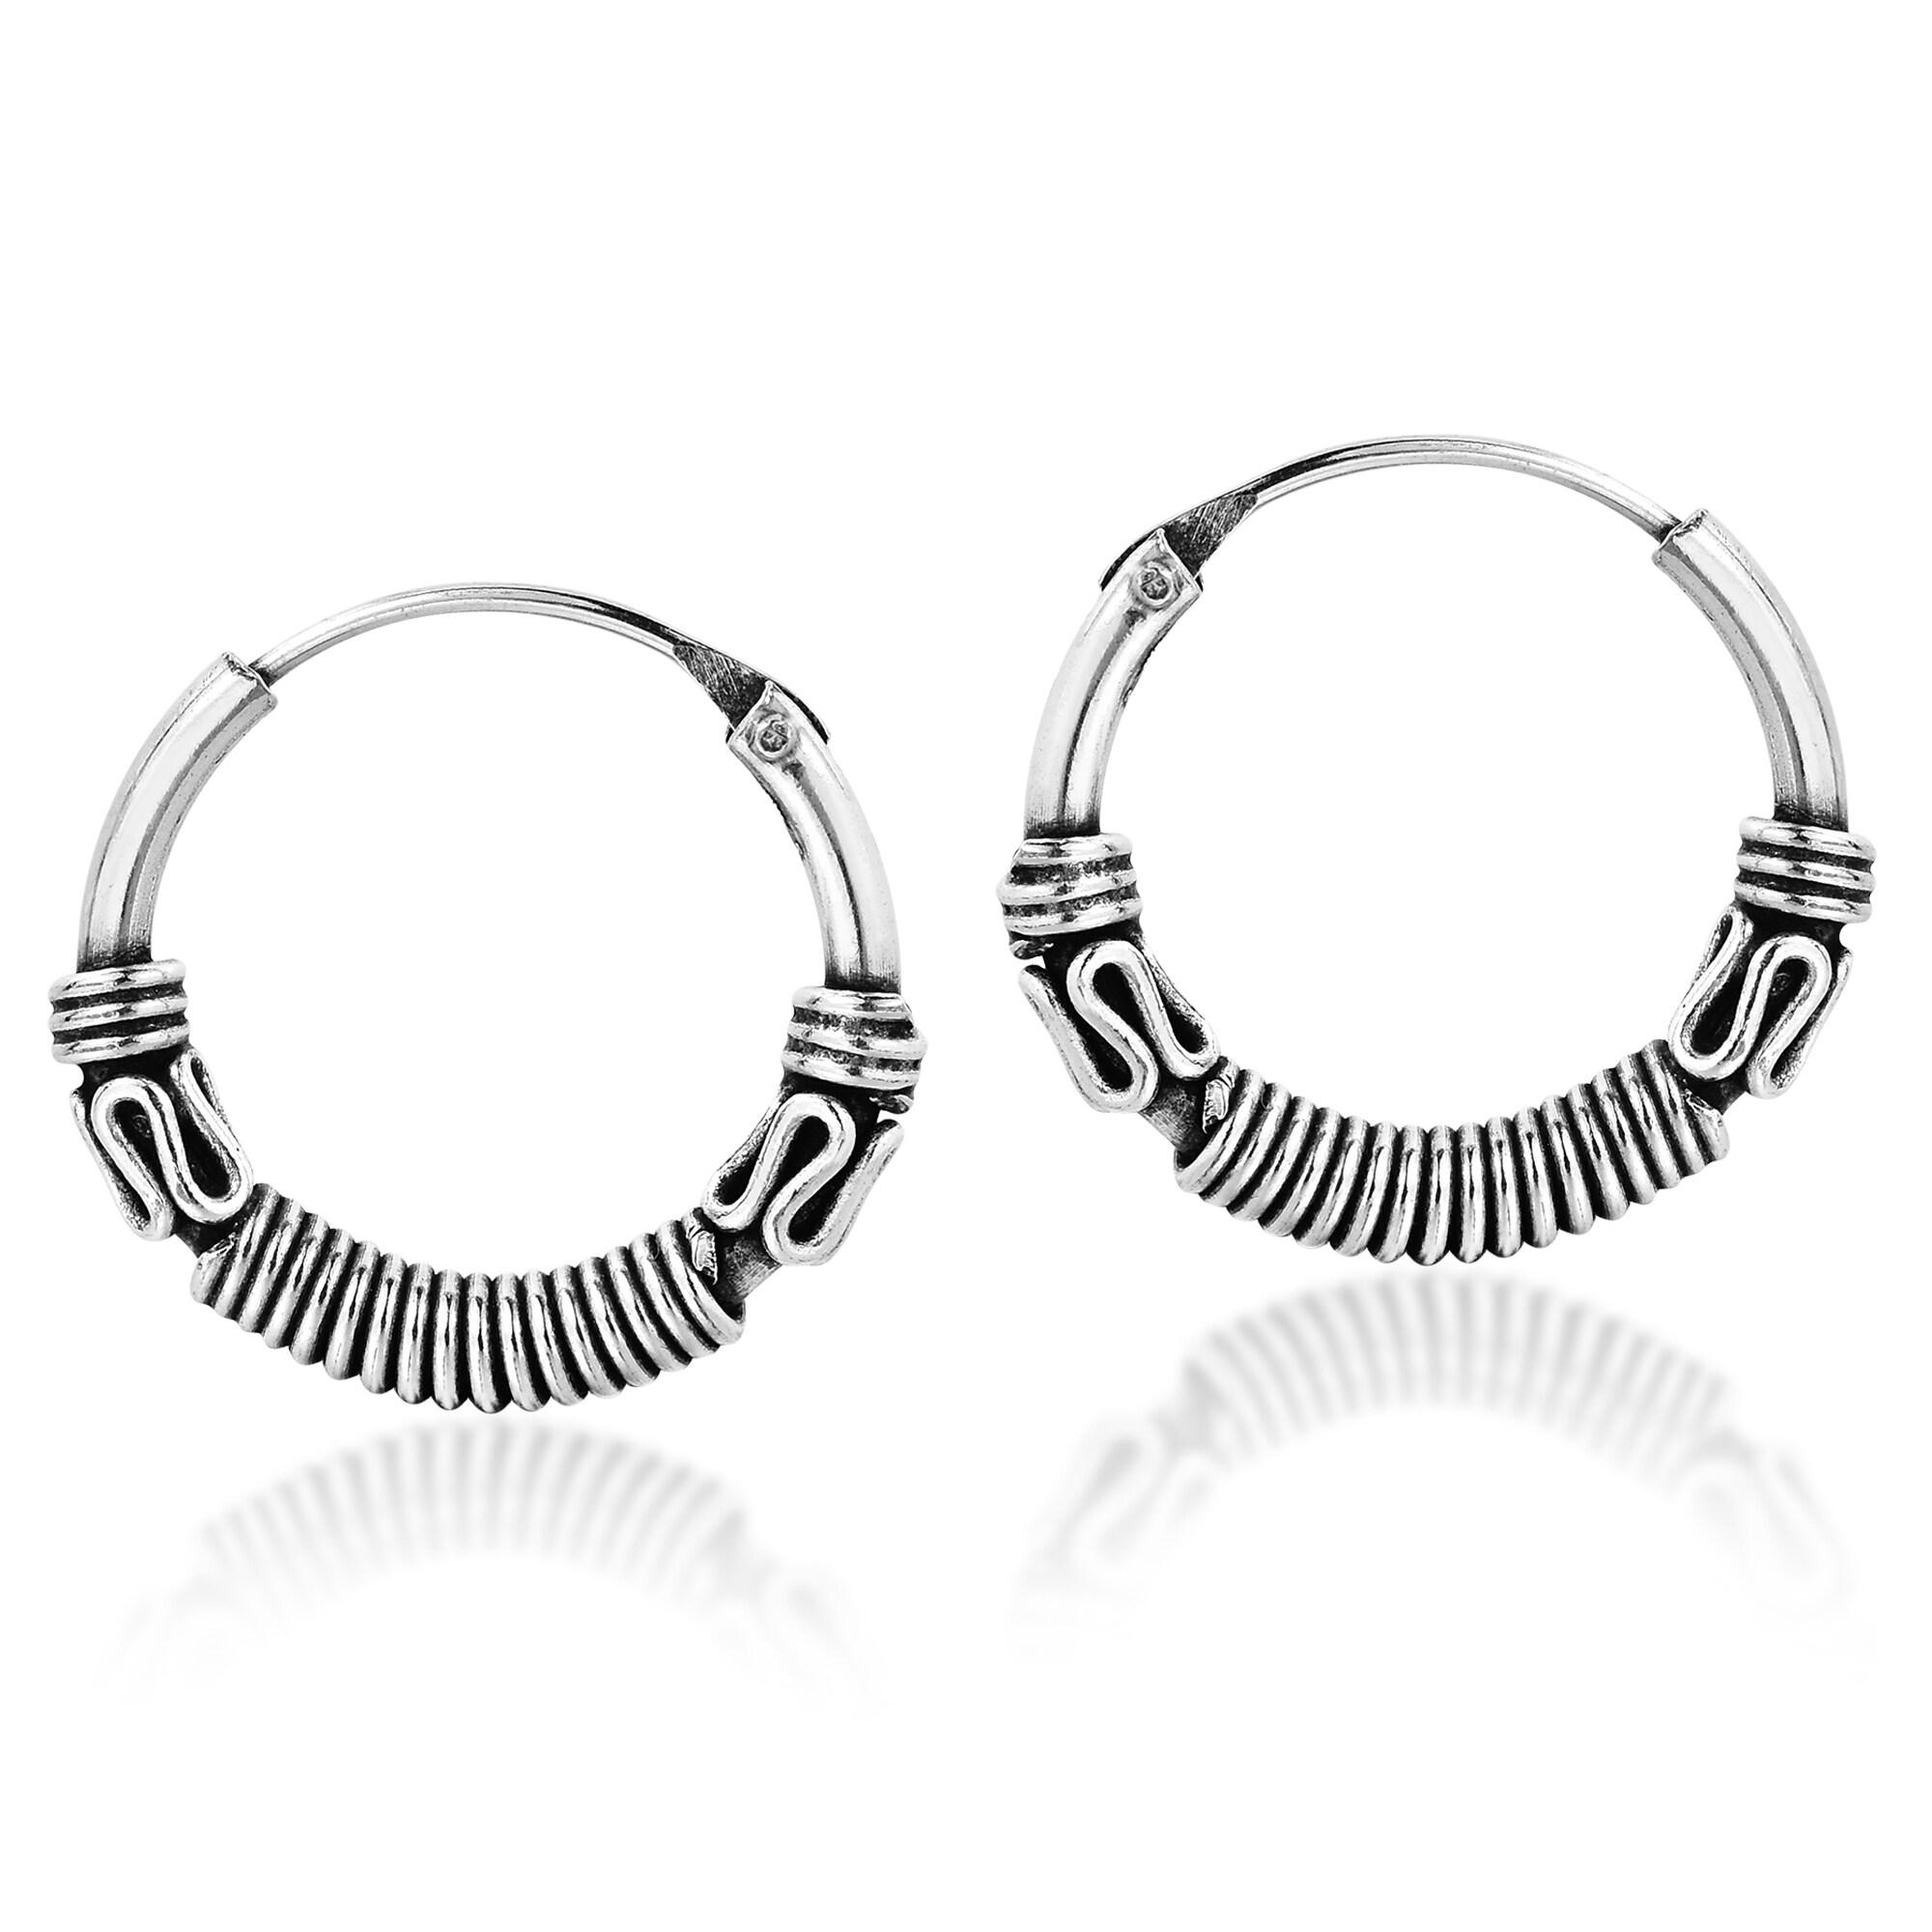 ea62ba9d4 Handmade Balinese Interlace Tribal Delicate Sterling Silver Hoop Earrings  (Thailand)